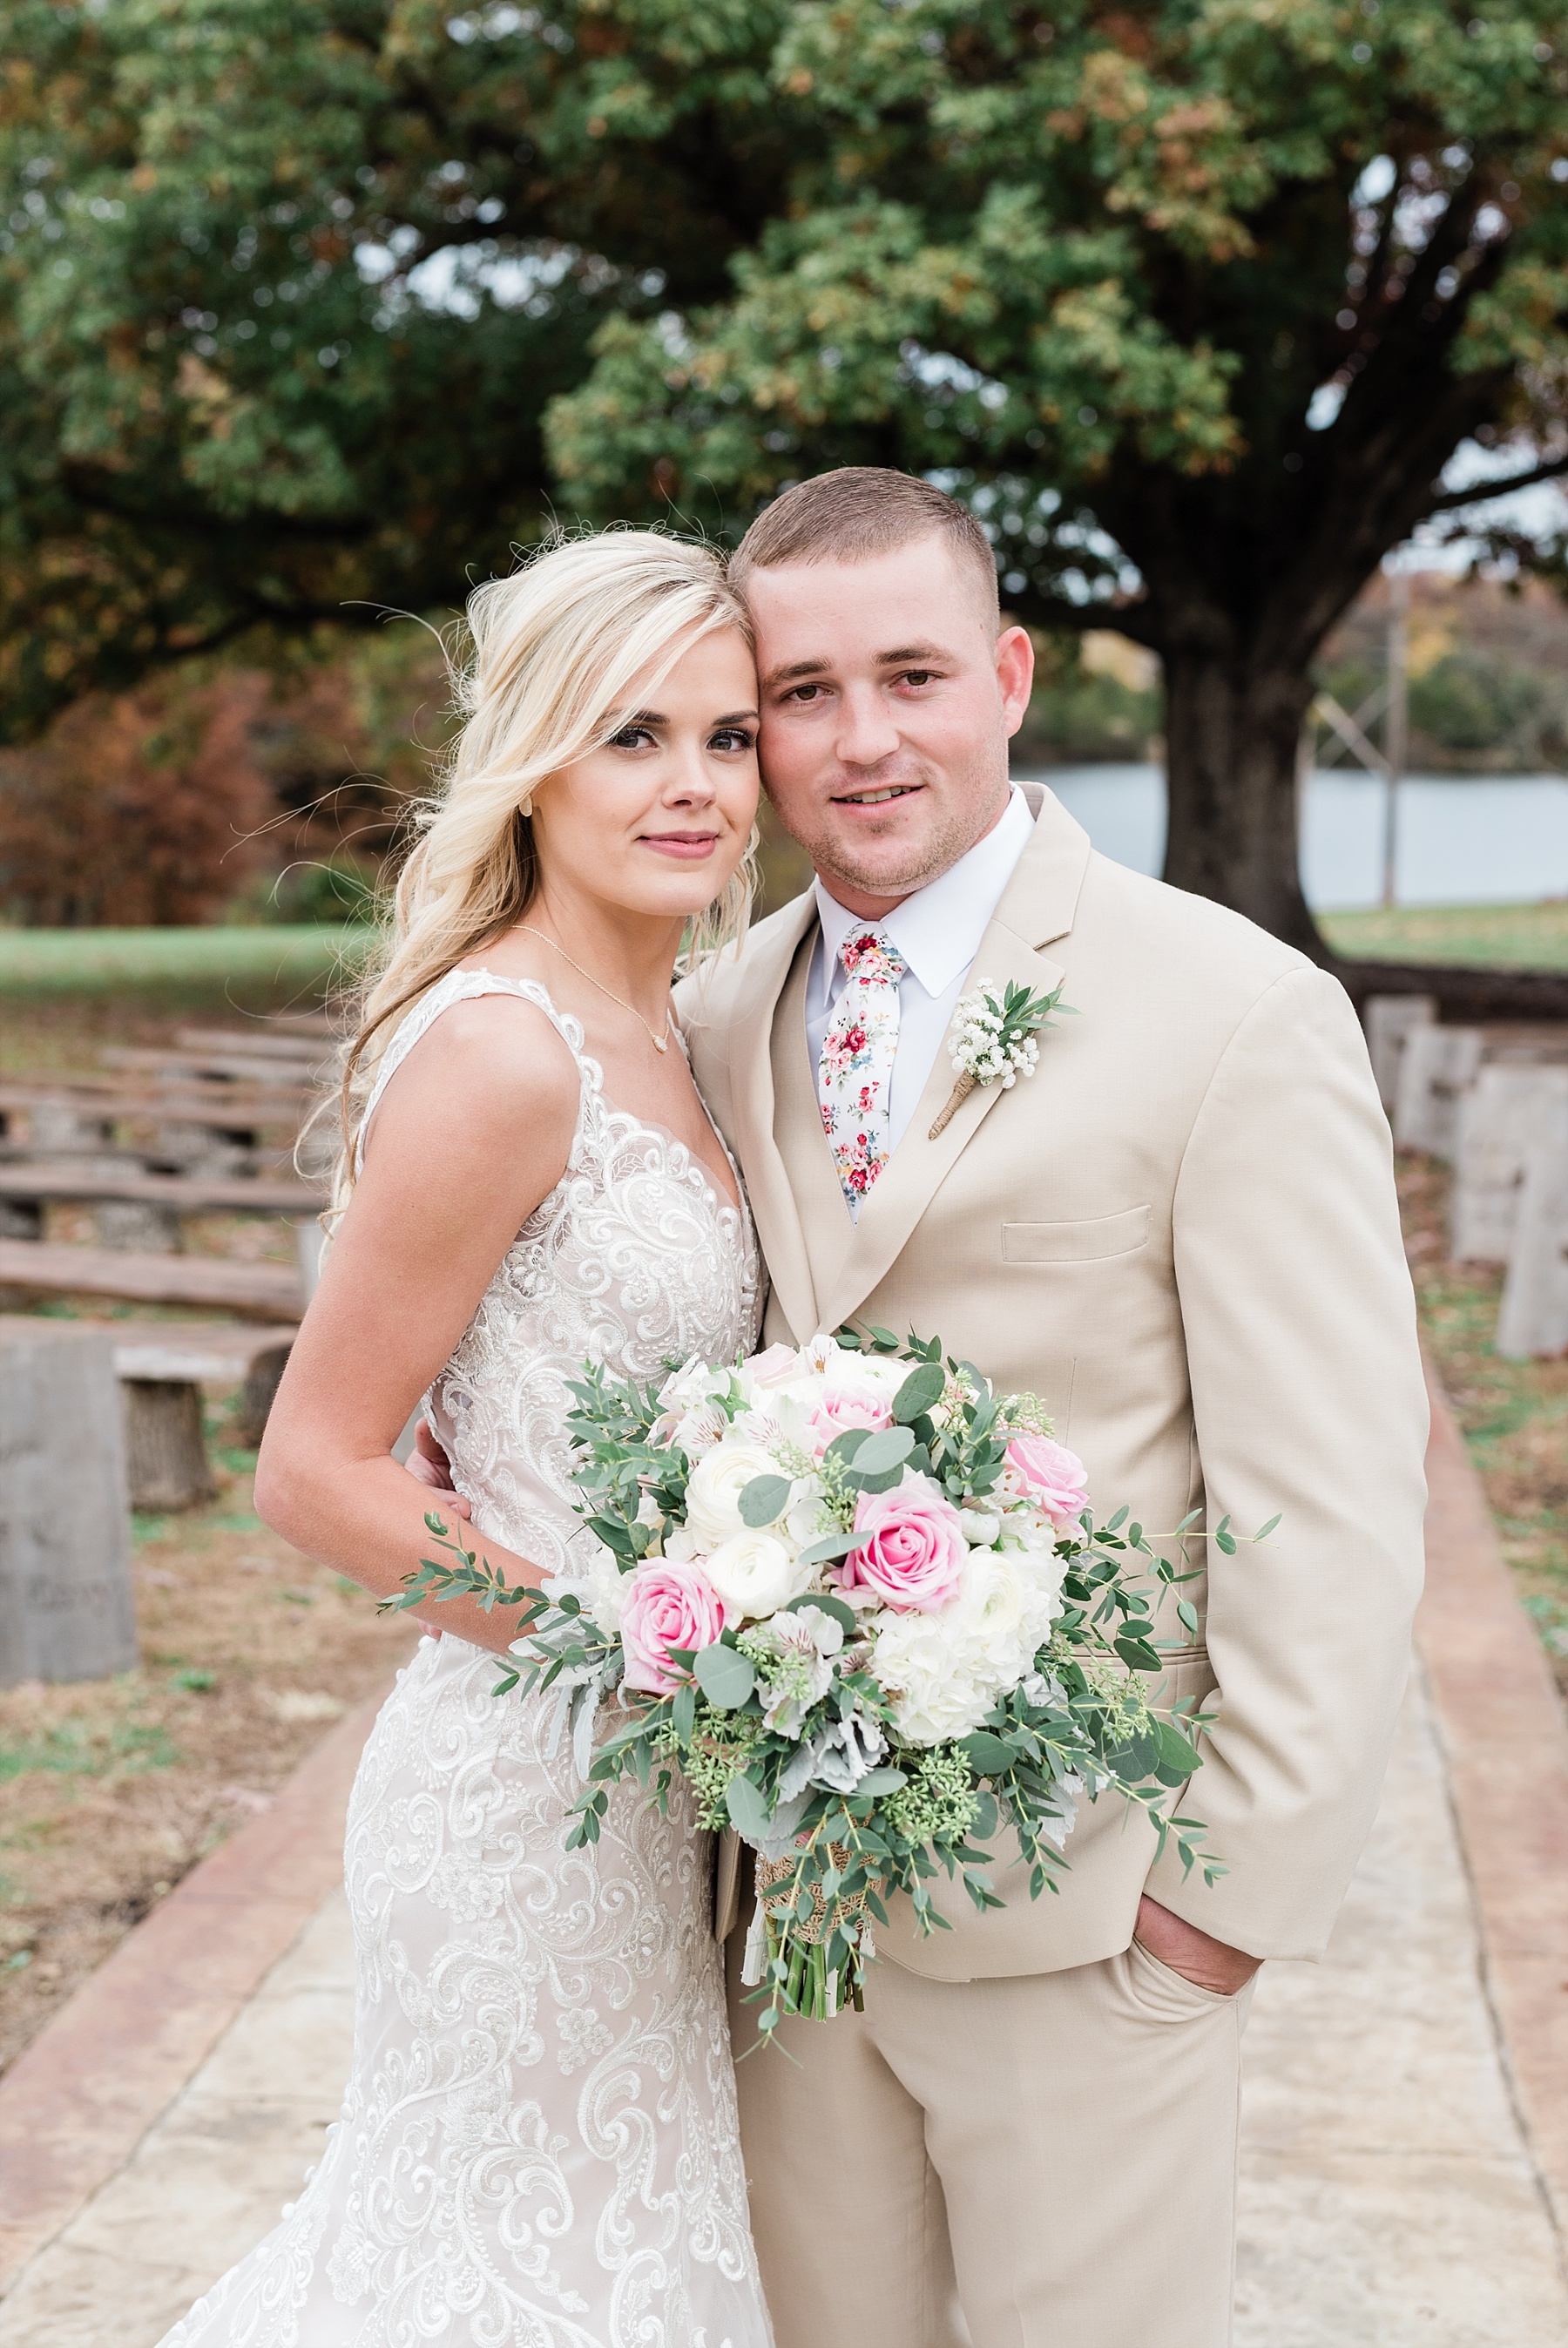 Lakeside Wedding in Fall at Mighty Oak Lodge by Misouri Wedding Photographer Kelsi Kliethermes Photography_0029.jpg